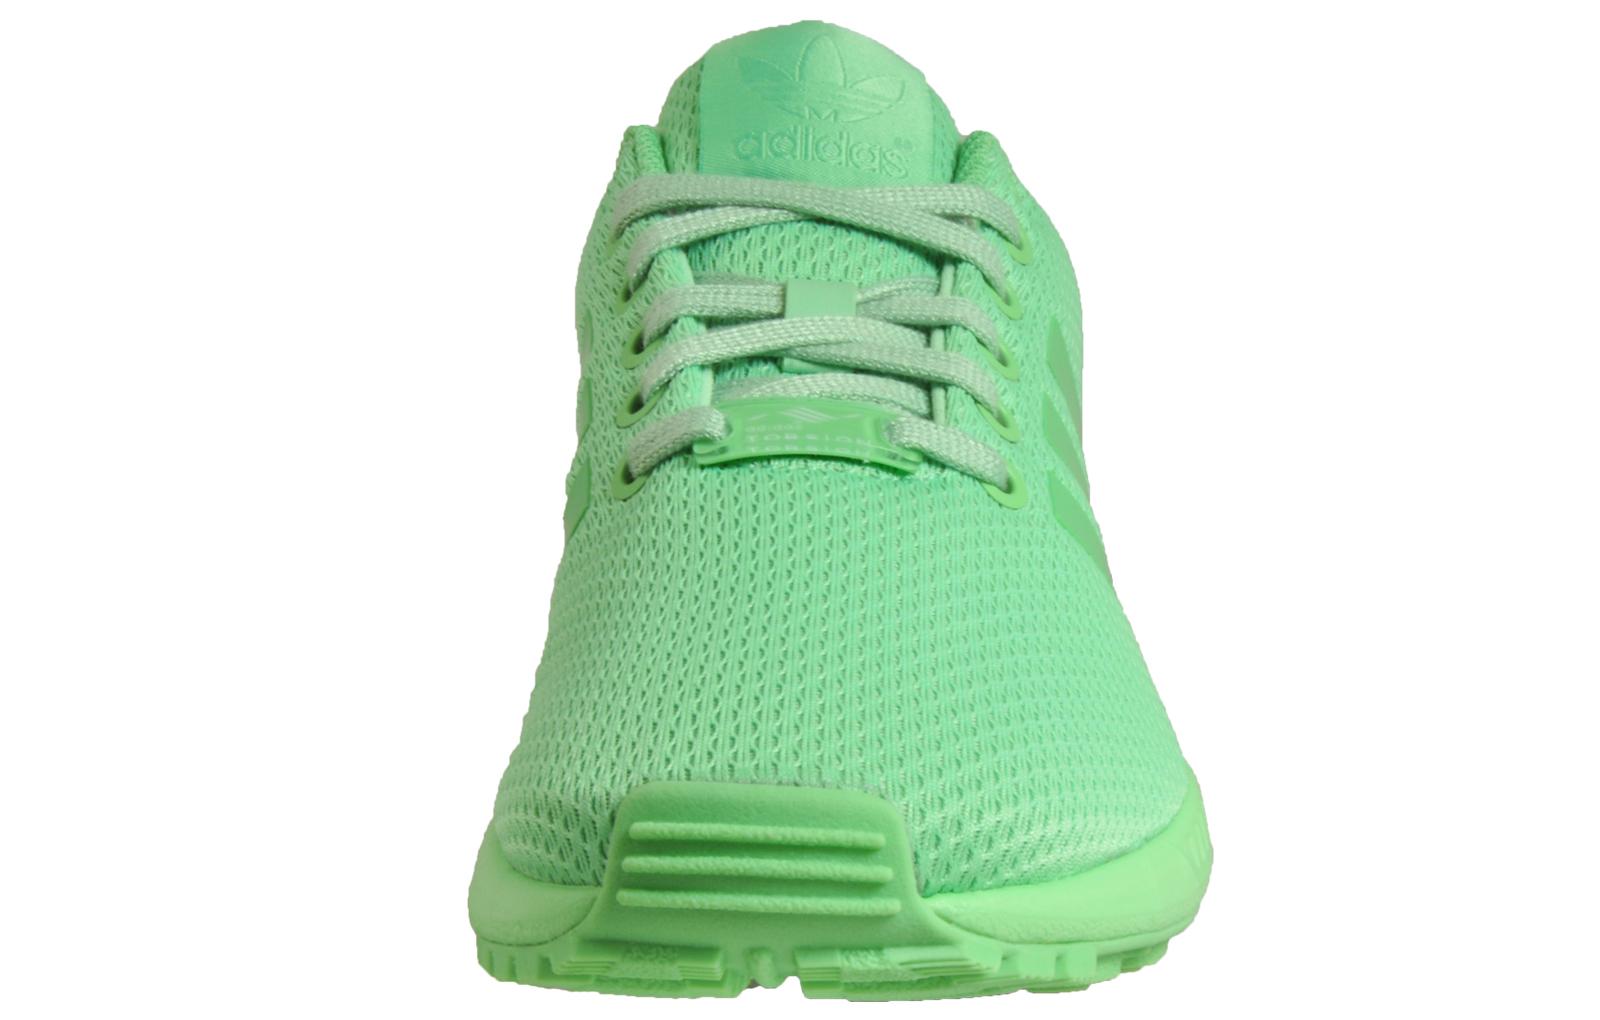 Details zu Adidas Originals ZX Flux Women's Classic Casual Gym Fitness Trainers Green